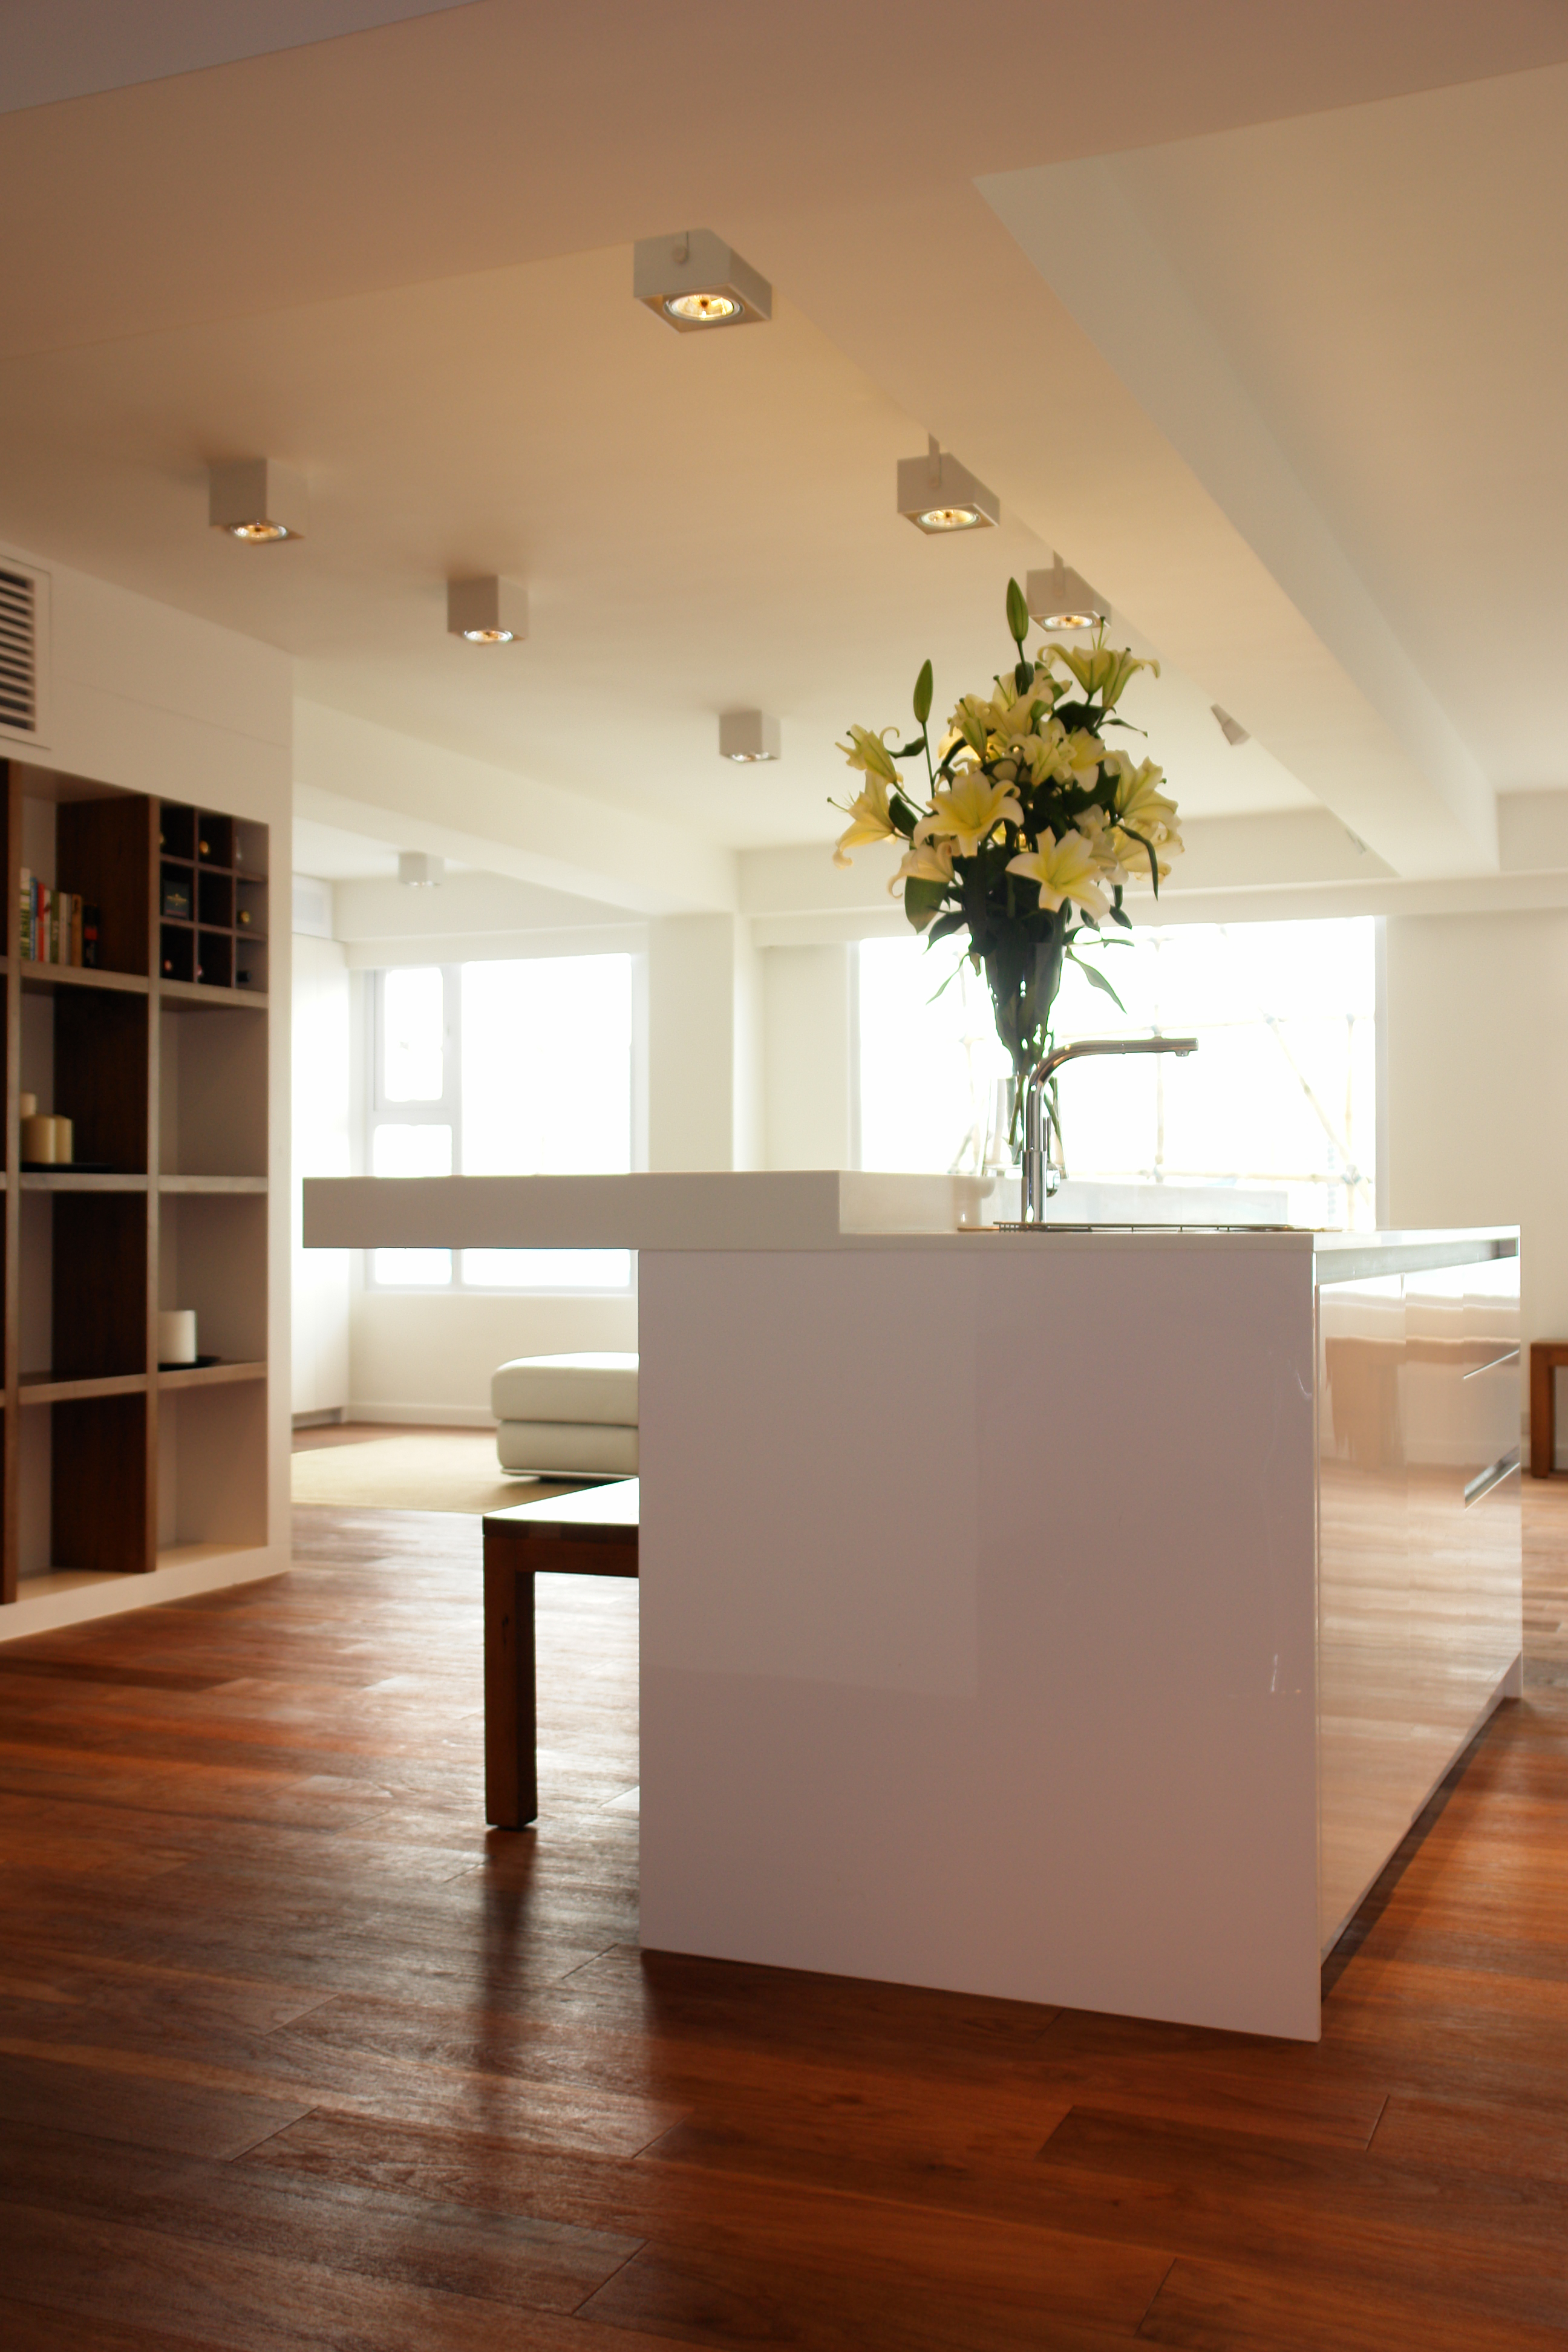 家居設計 Home Design hk 甜美的澳大利亞 Home Sweet Home Australia (14)